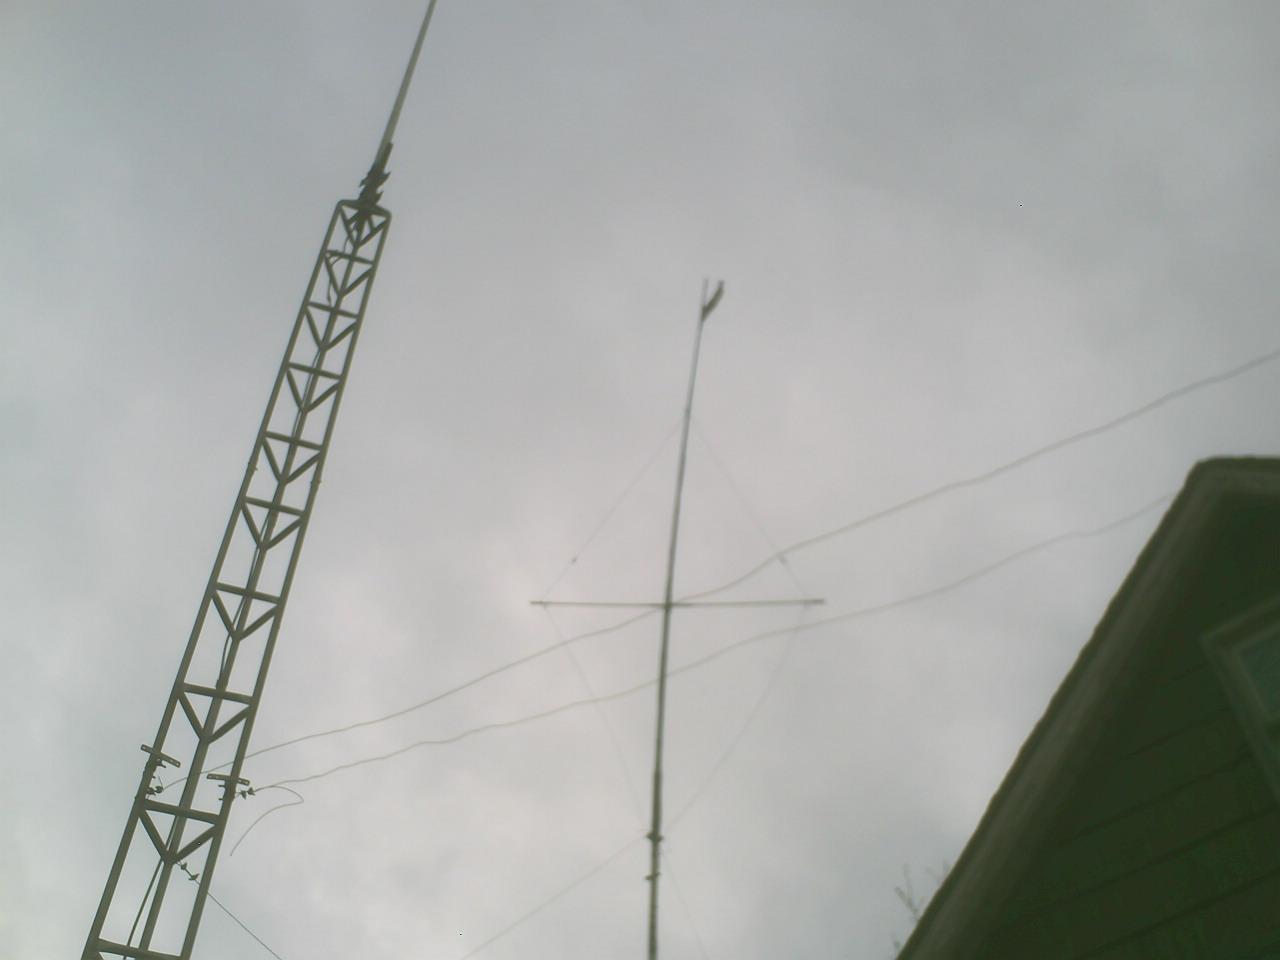 cb base antennas 5 8 wave collinear